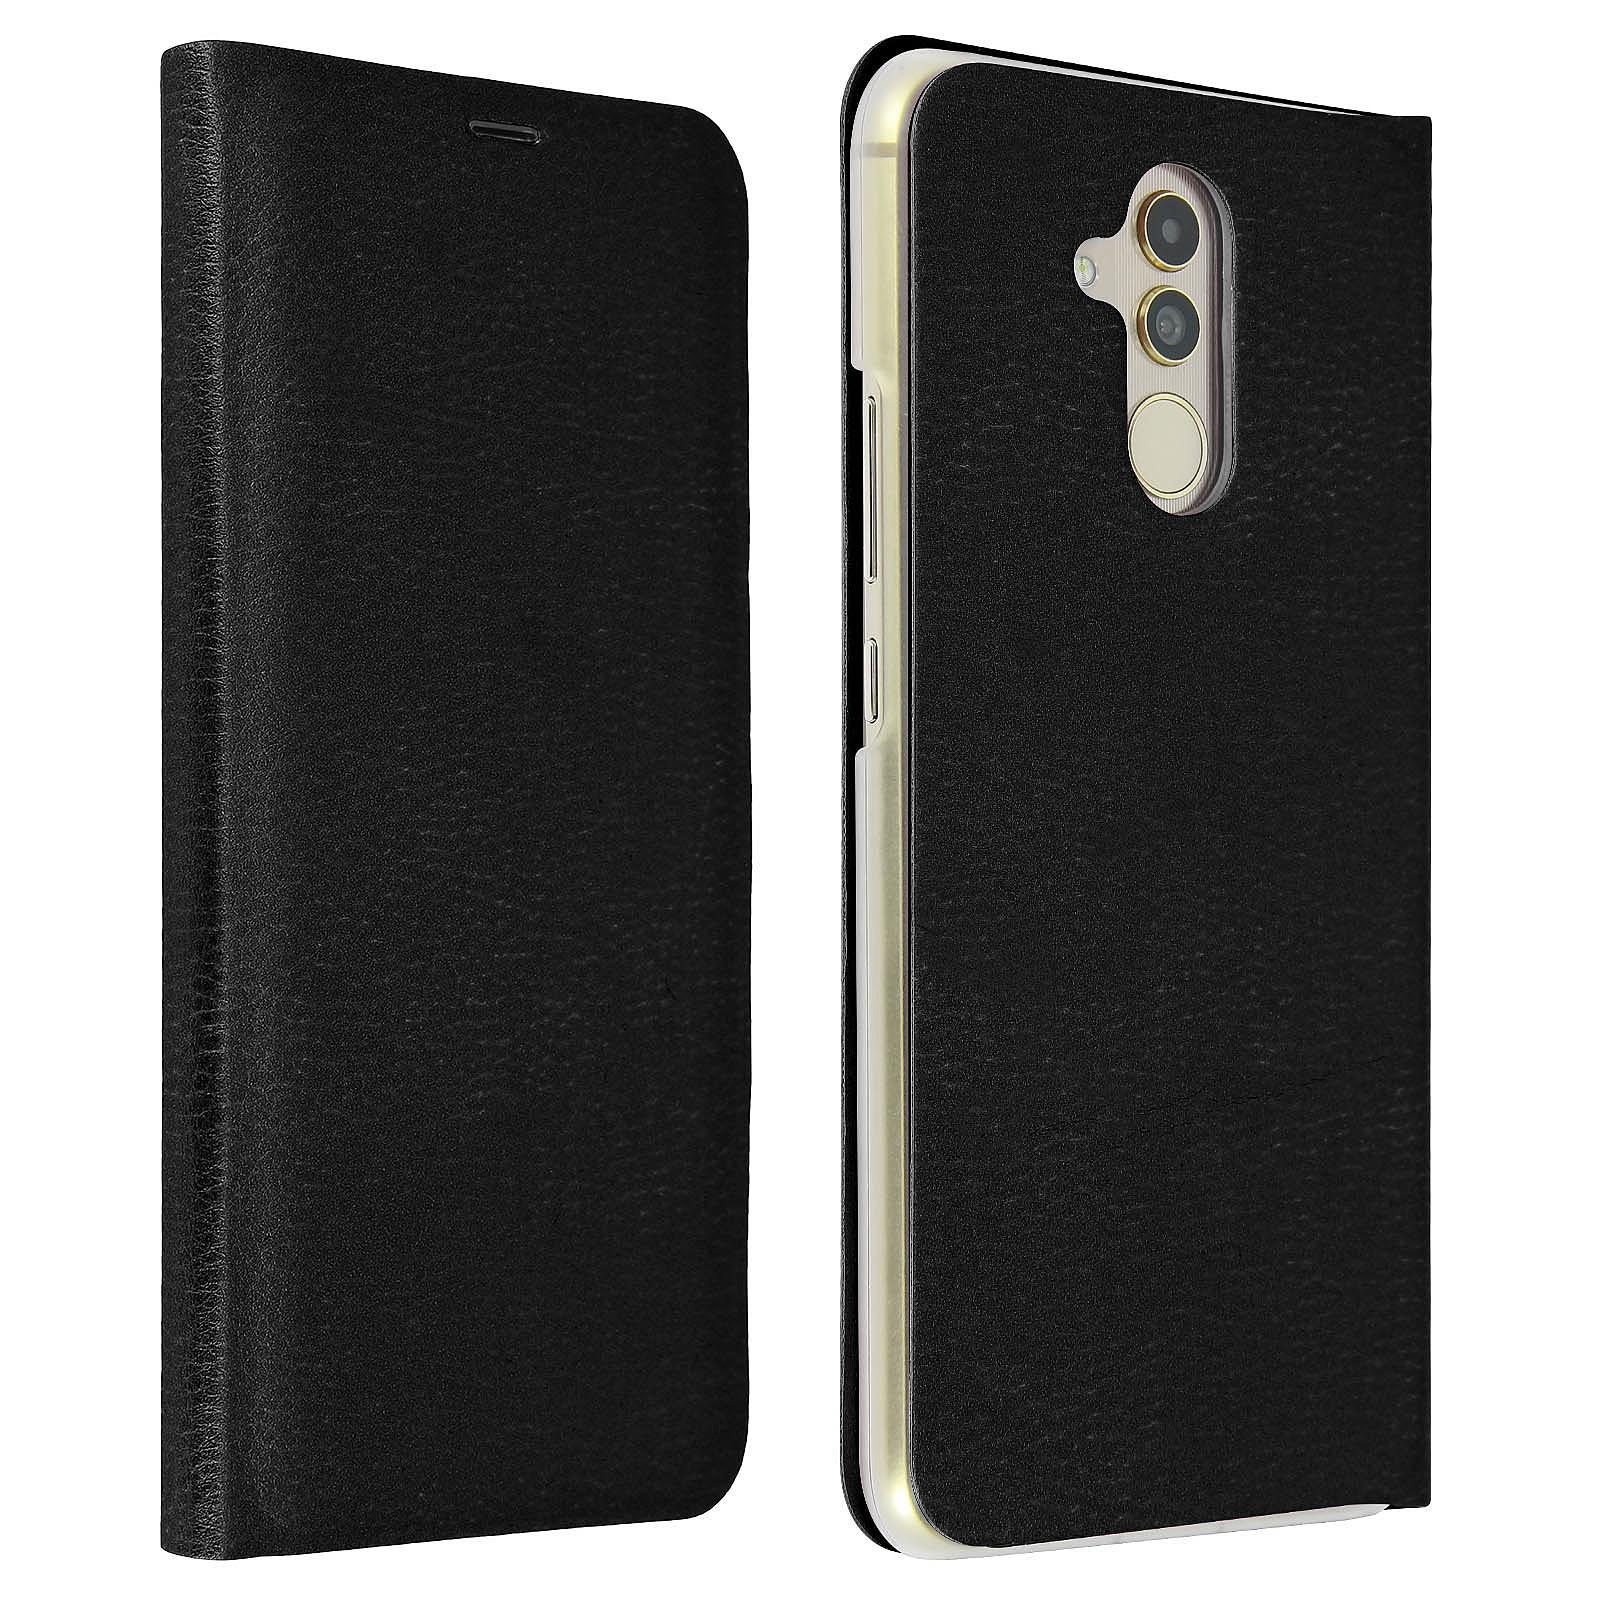 Avizar Etui folio Noir Éco-cuir pour Huawei Mate 20 Lite